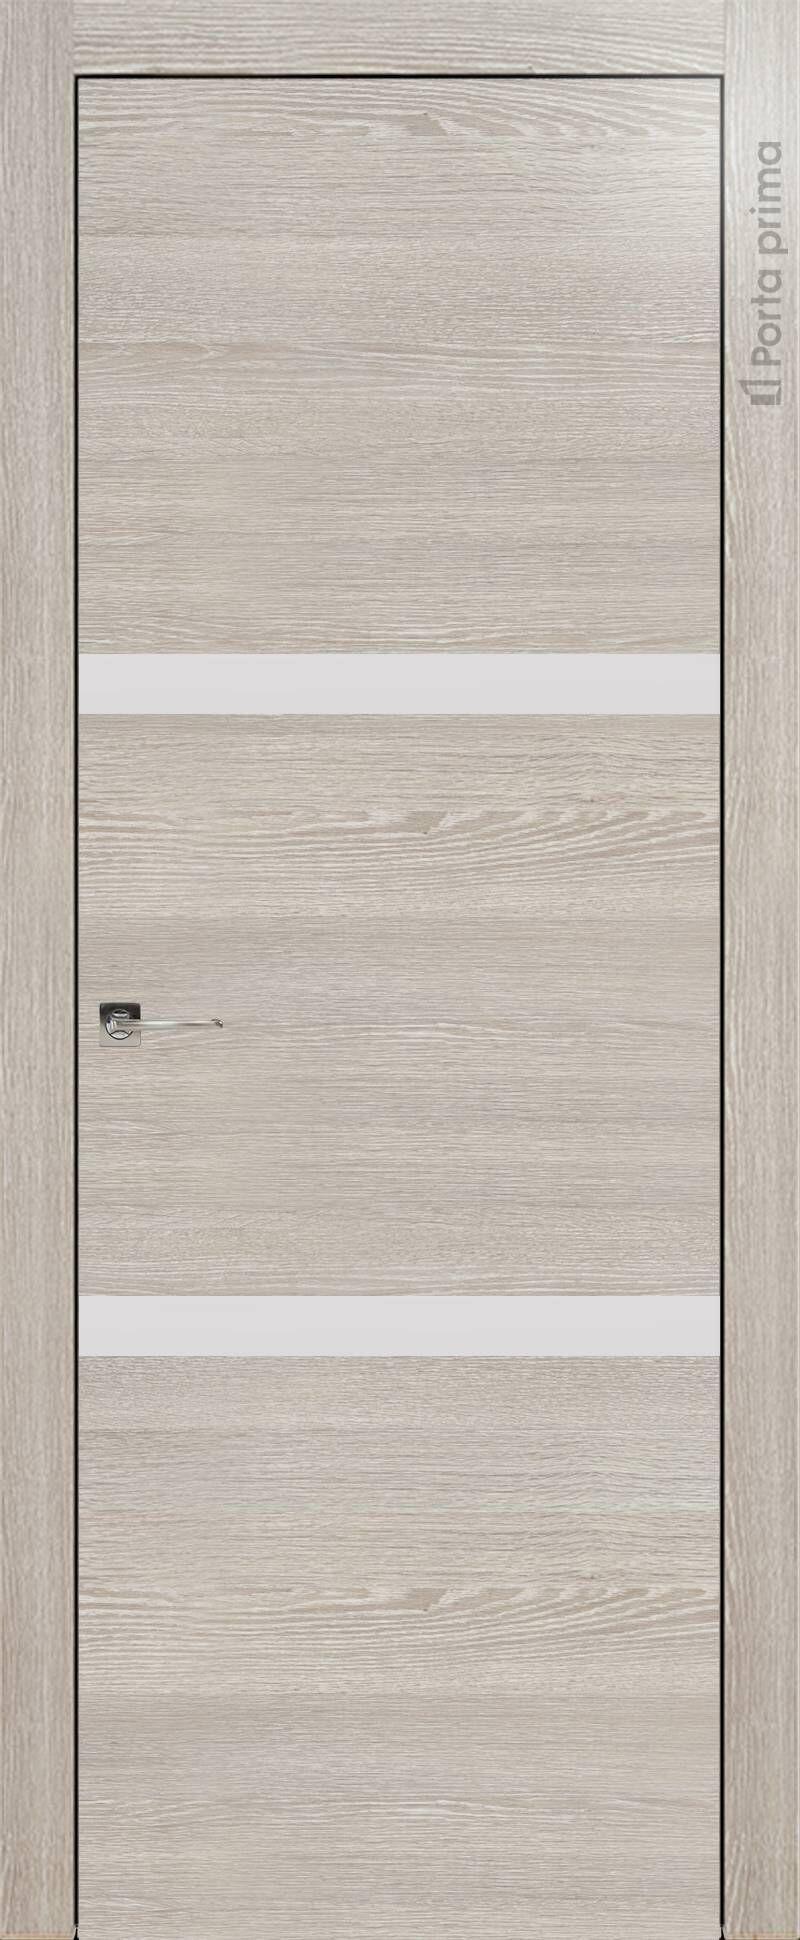 Tivoli В-4 цвет - Серый дуб Без стекла (ДГ)